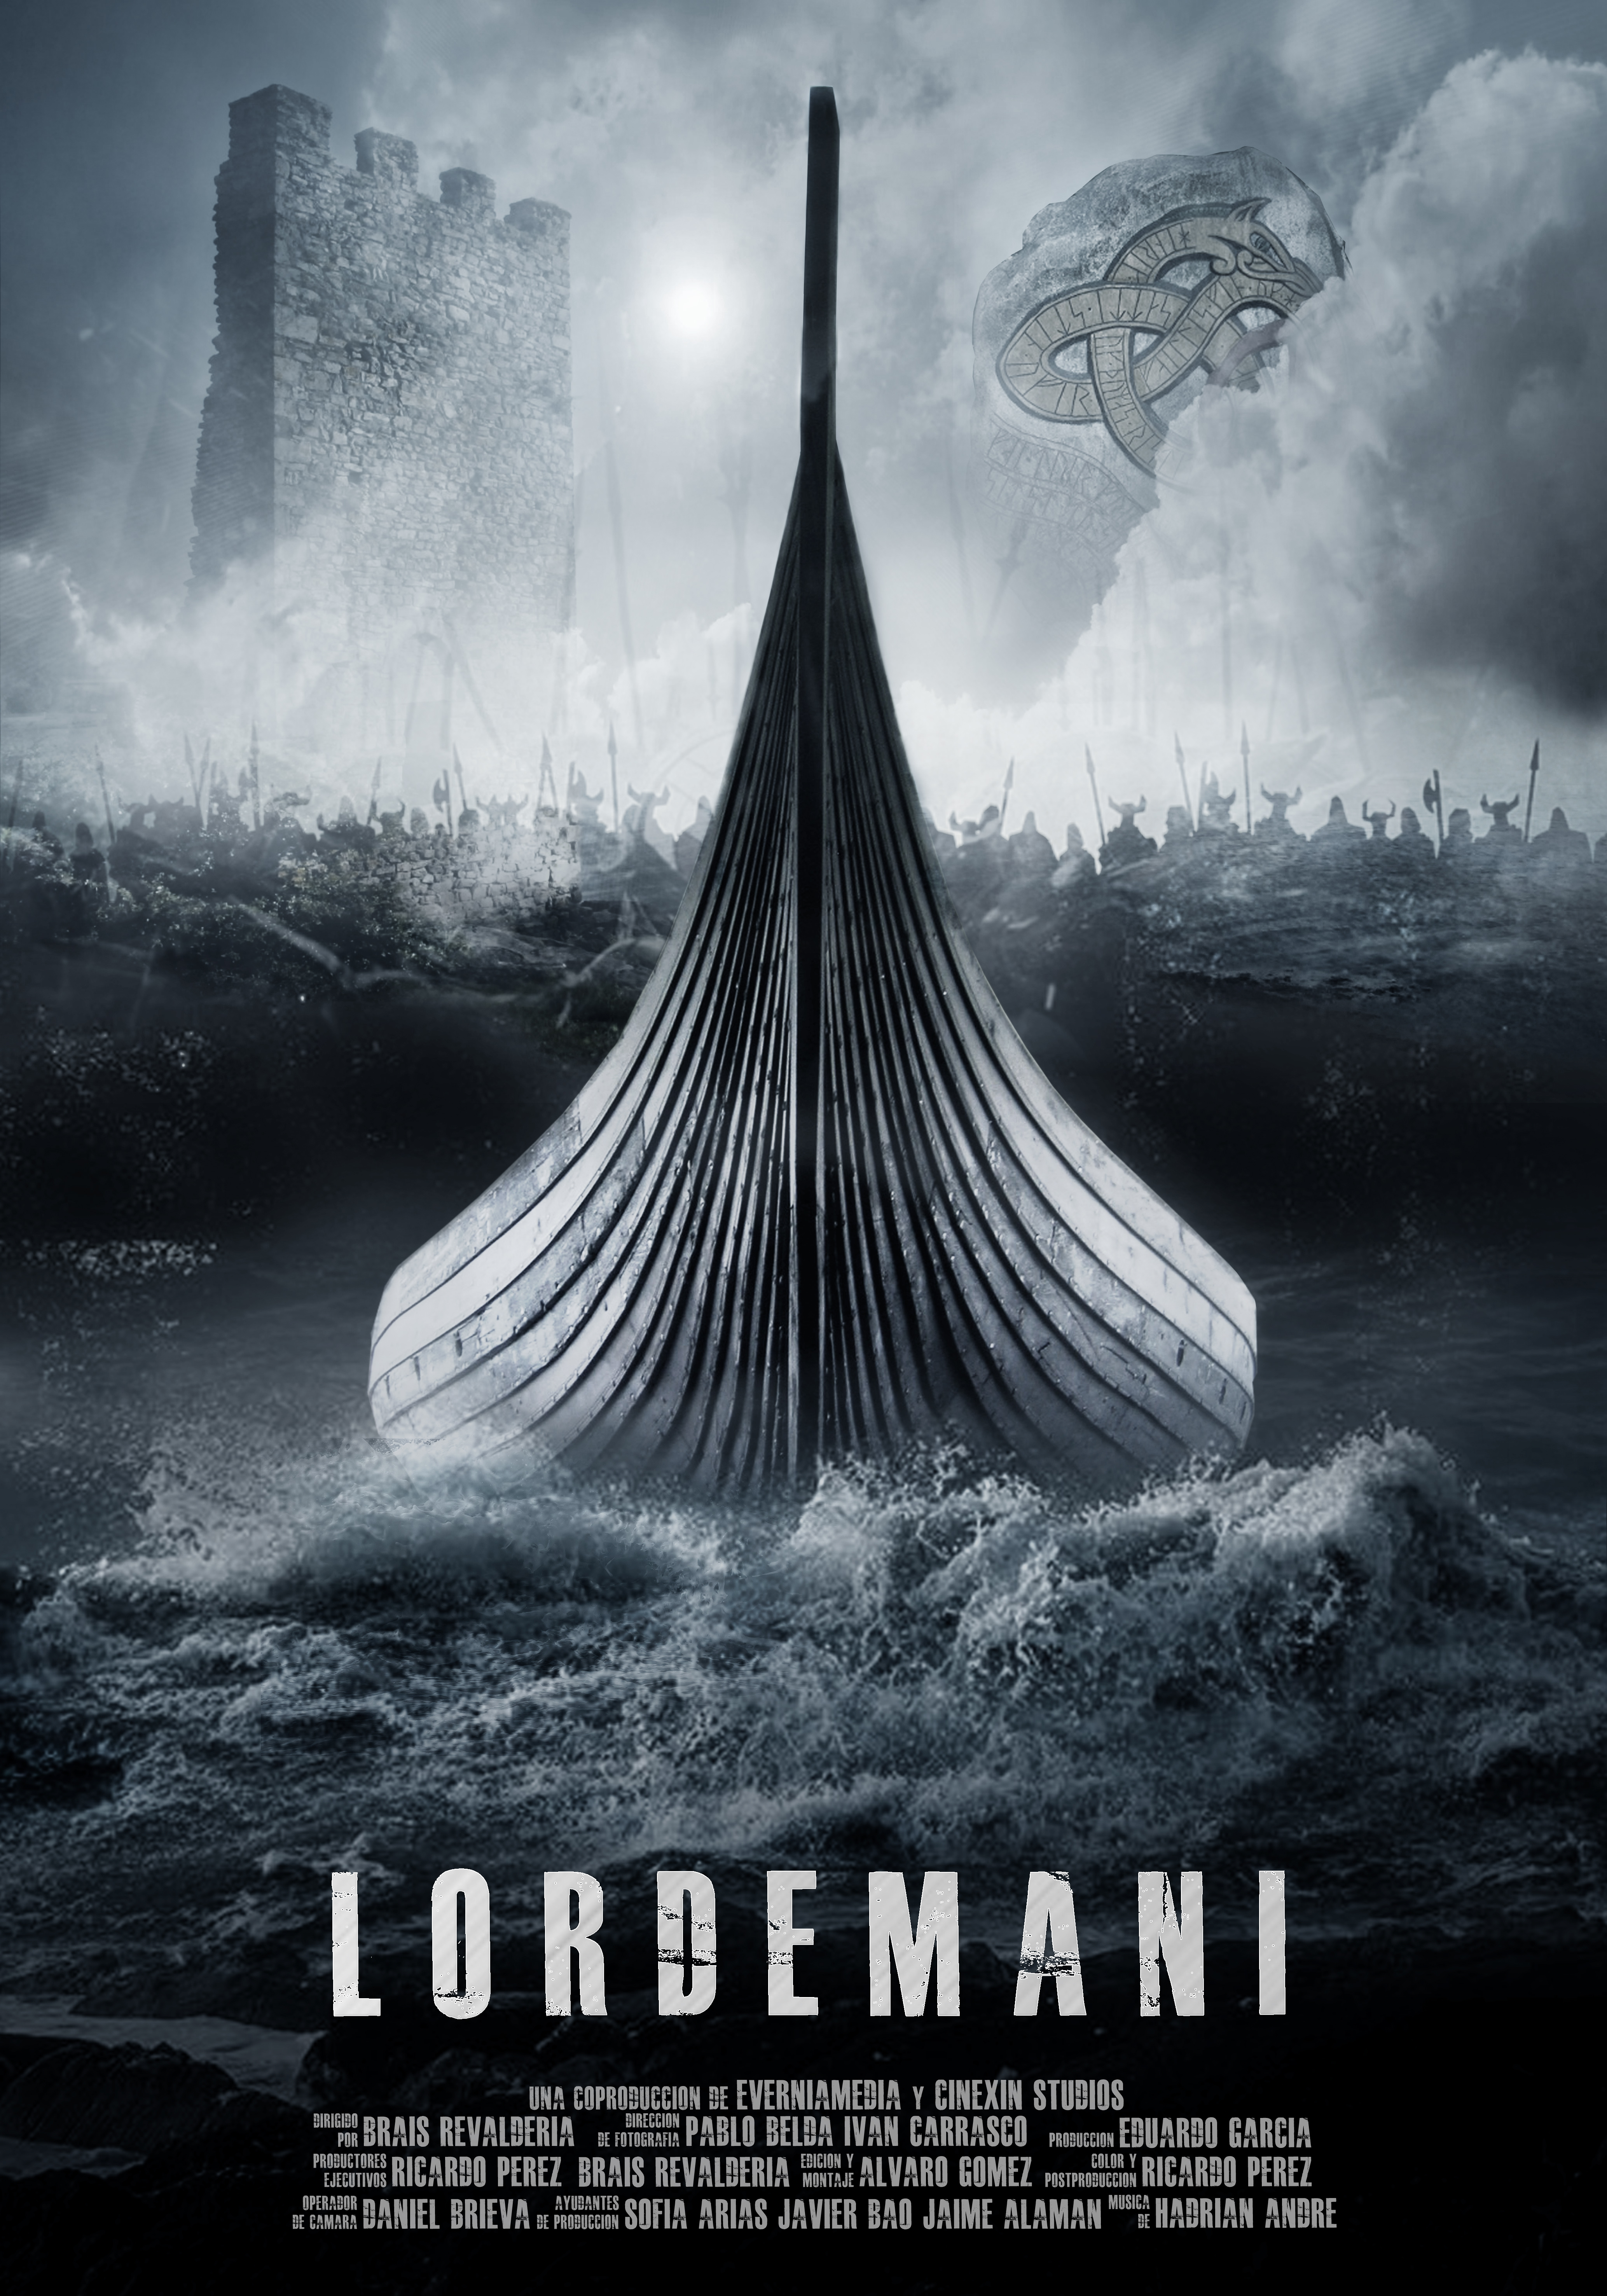 Lordemani